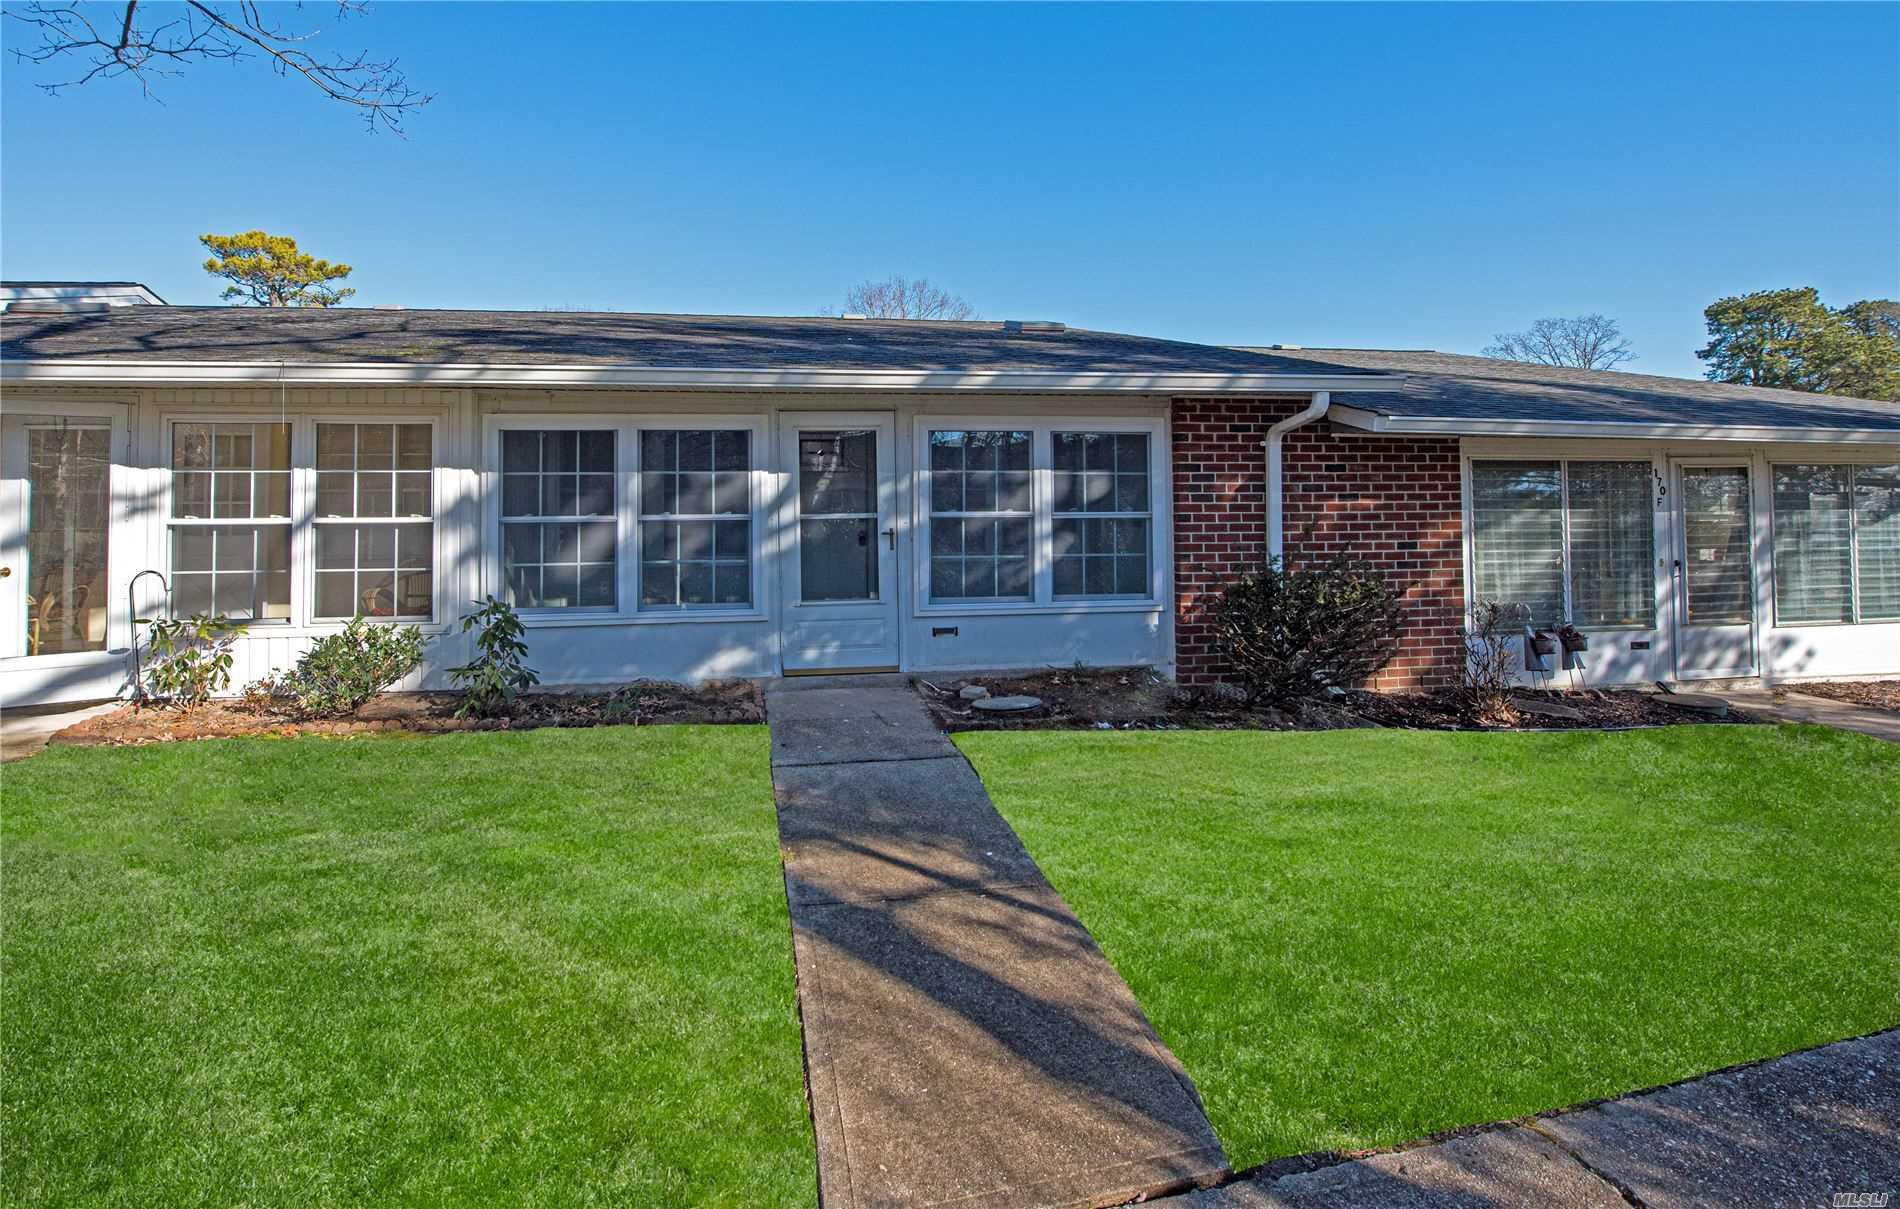 Property for sale at 170 Ventry Court, Ridge NY 11961, Ridge,  New York 11961